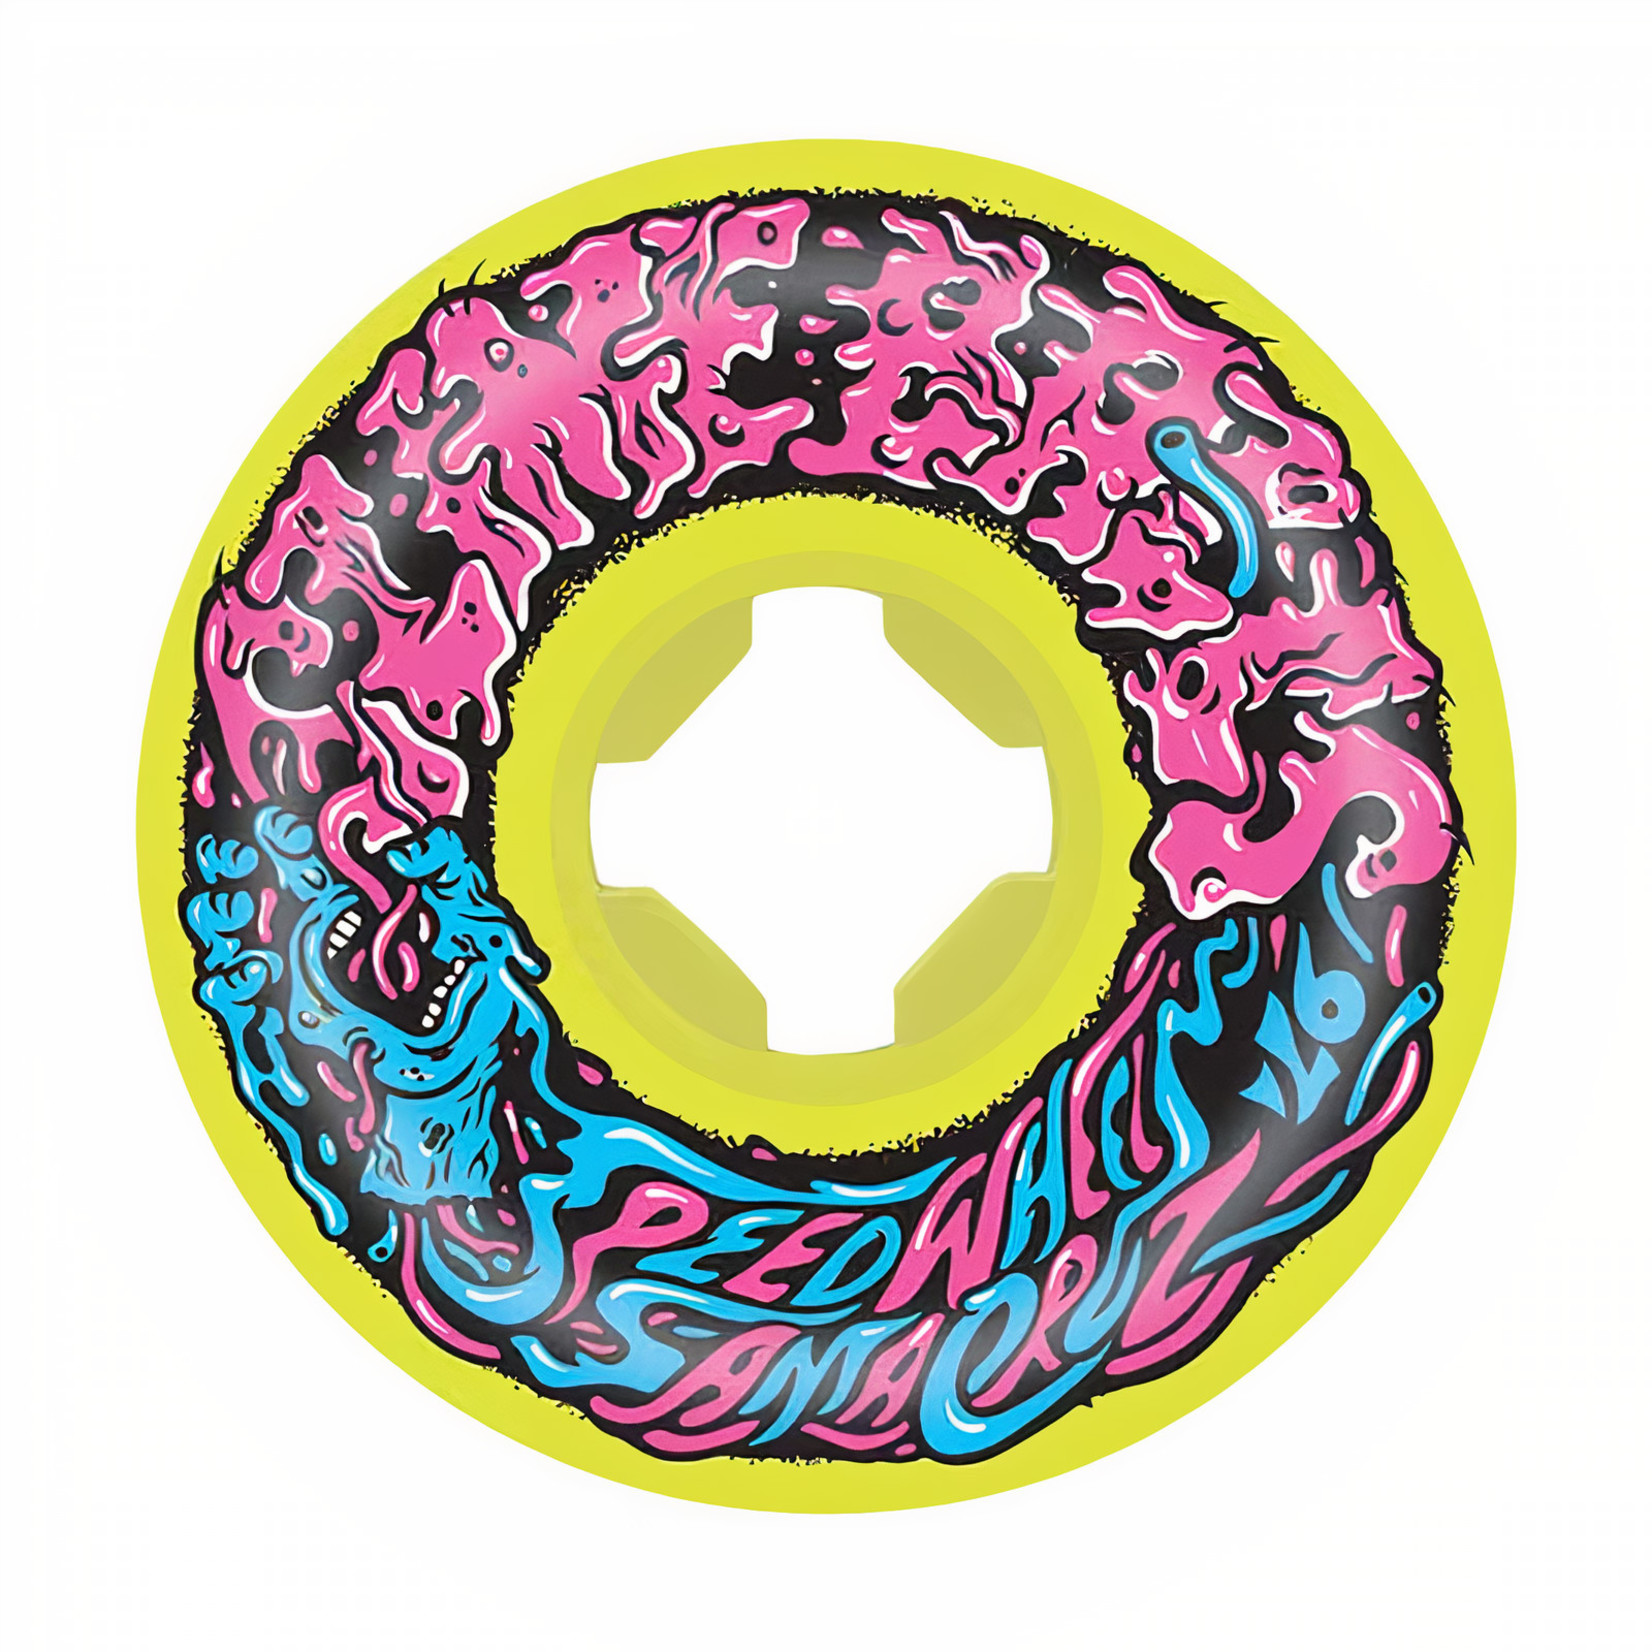 Slime Balls Slime Balls - Wheels - 97a Vomit Mini II - Yellow 54mm